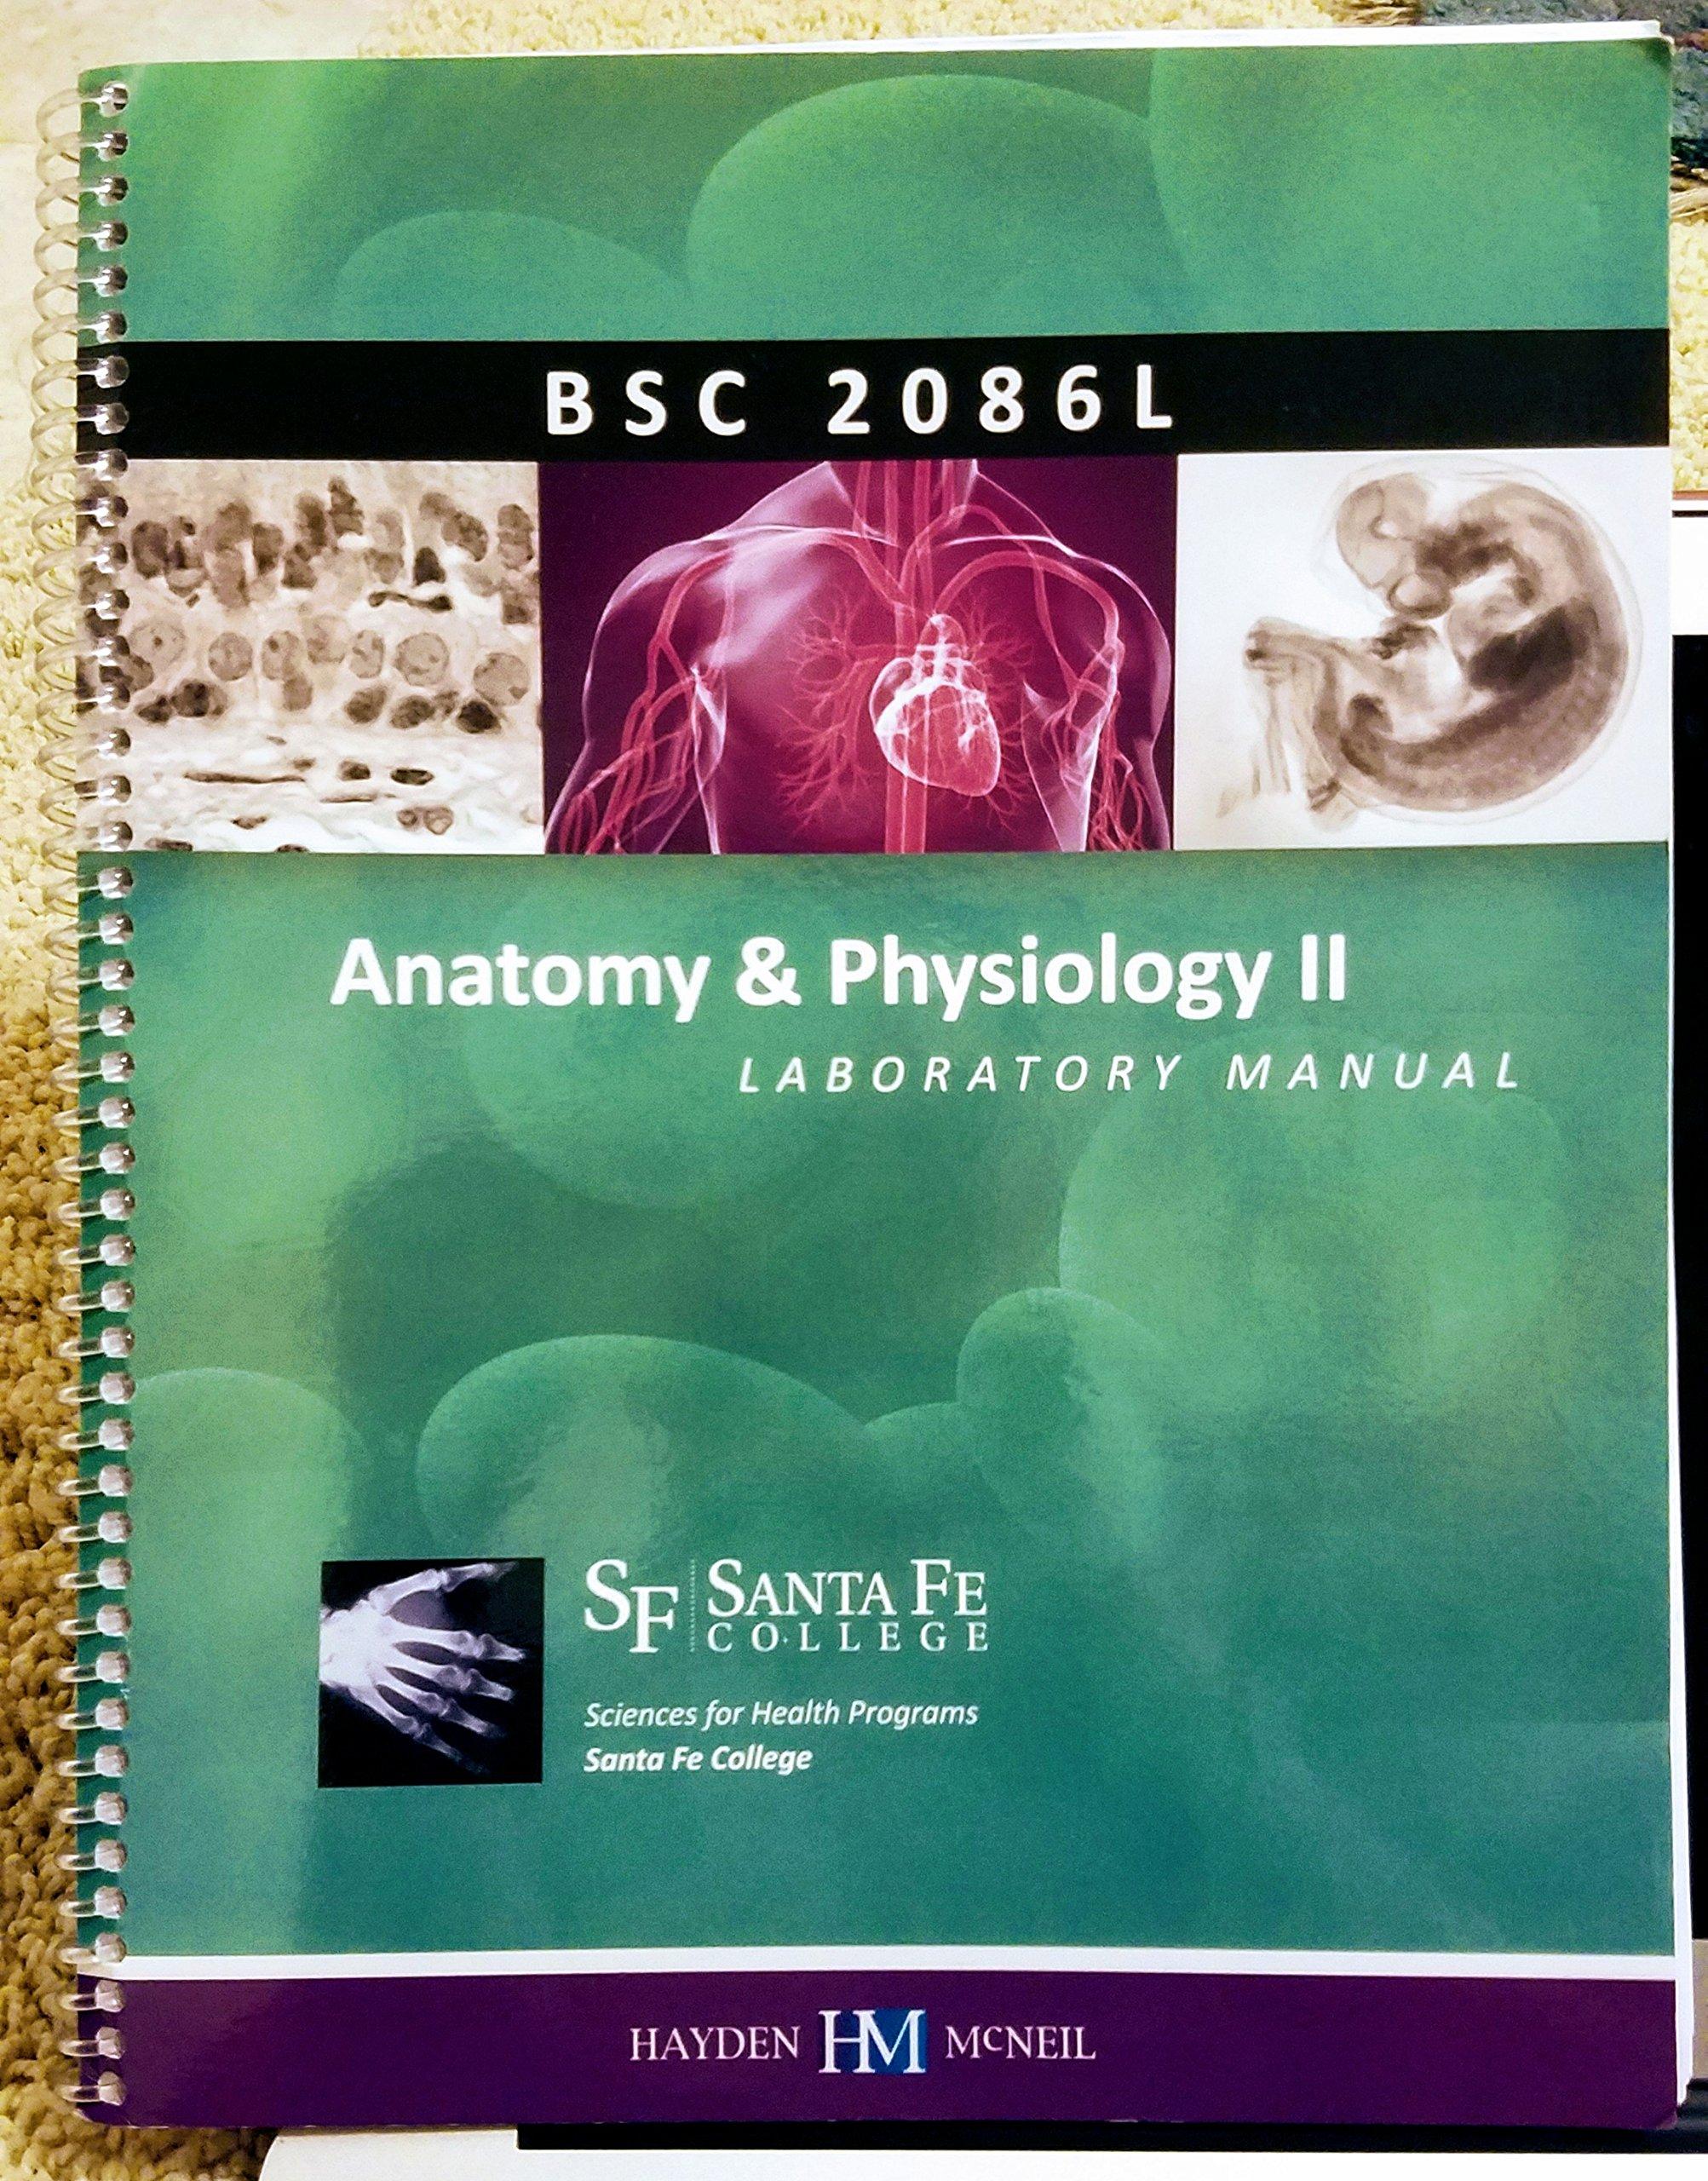 BSC 2086 L Anatomy & Physiology Laboratory Manual Santa Fe College Lab  BSC2086L: DC Rhonda Feldheim, PhD Nilanjana Sengupta, MD Samia Williams: ...